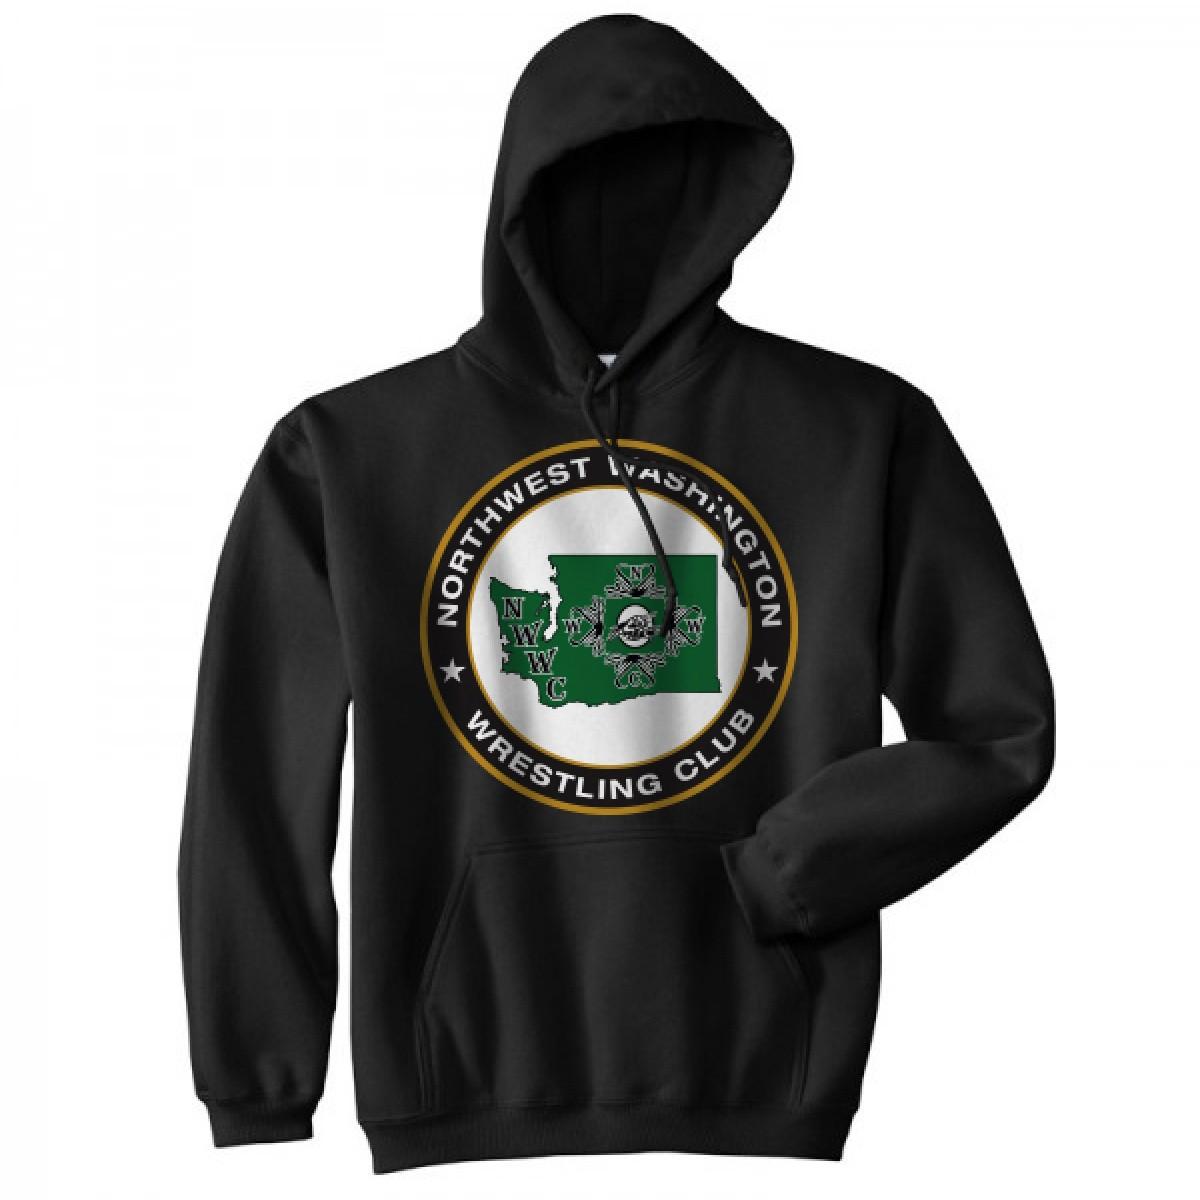 NWWC Black Hoodie With Green Logo-Black-S